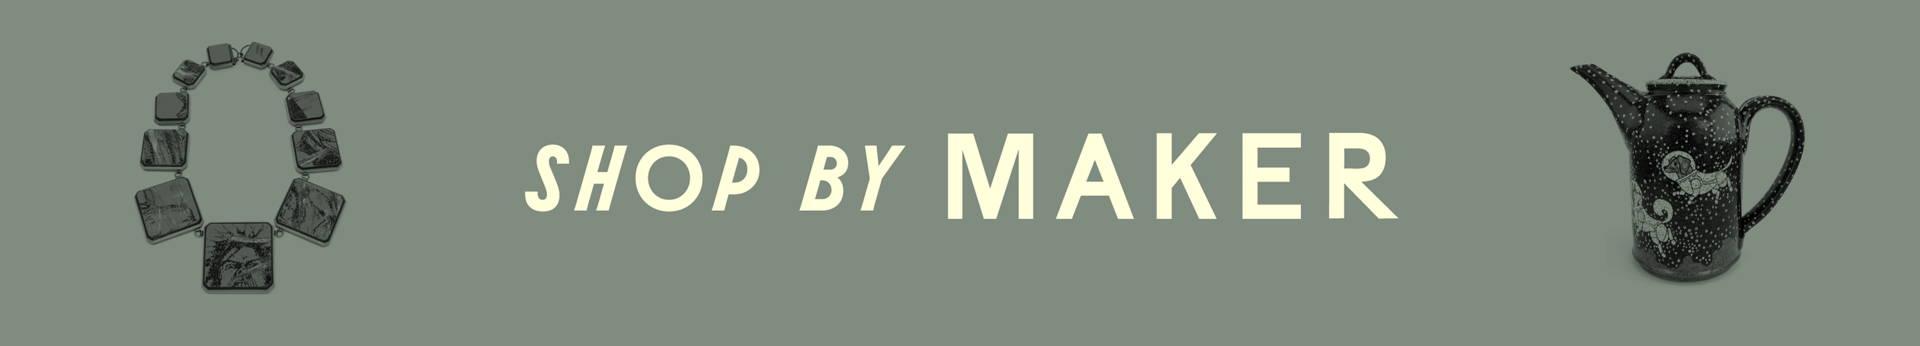 Shop by Maker